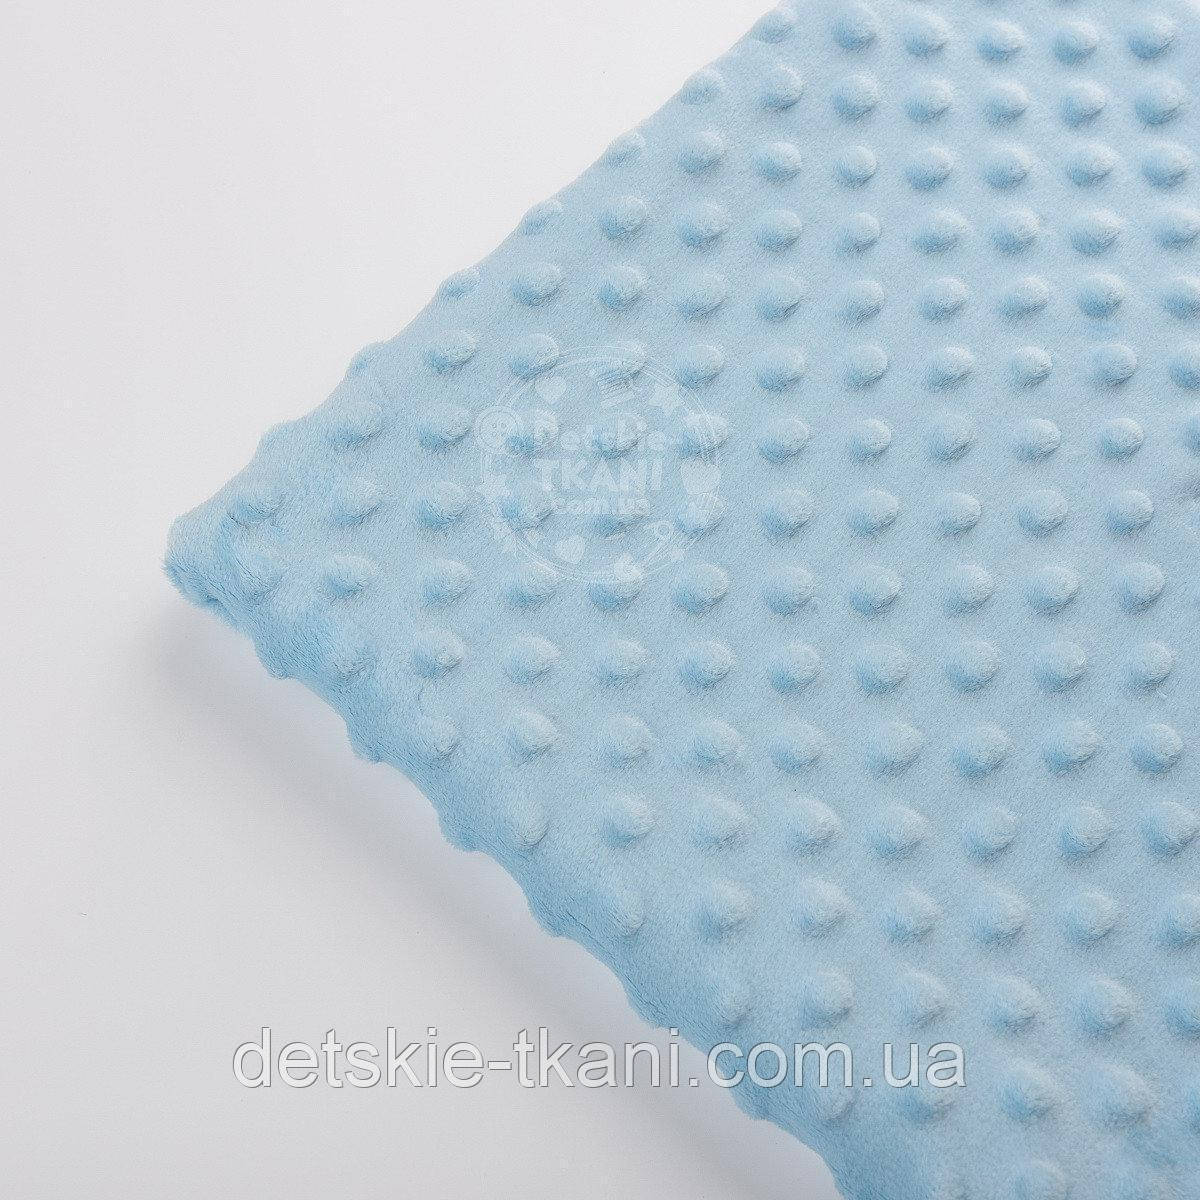 Лоскут ткани М-6 плюш минки голубого цвета, размер 70*160 см